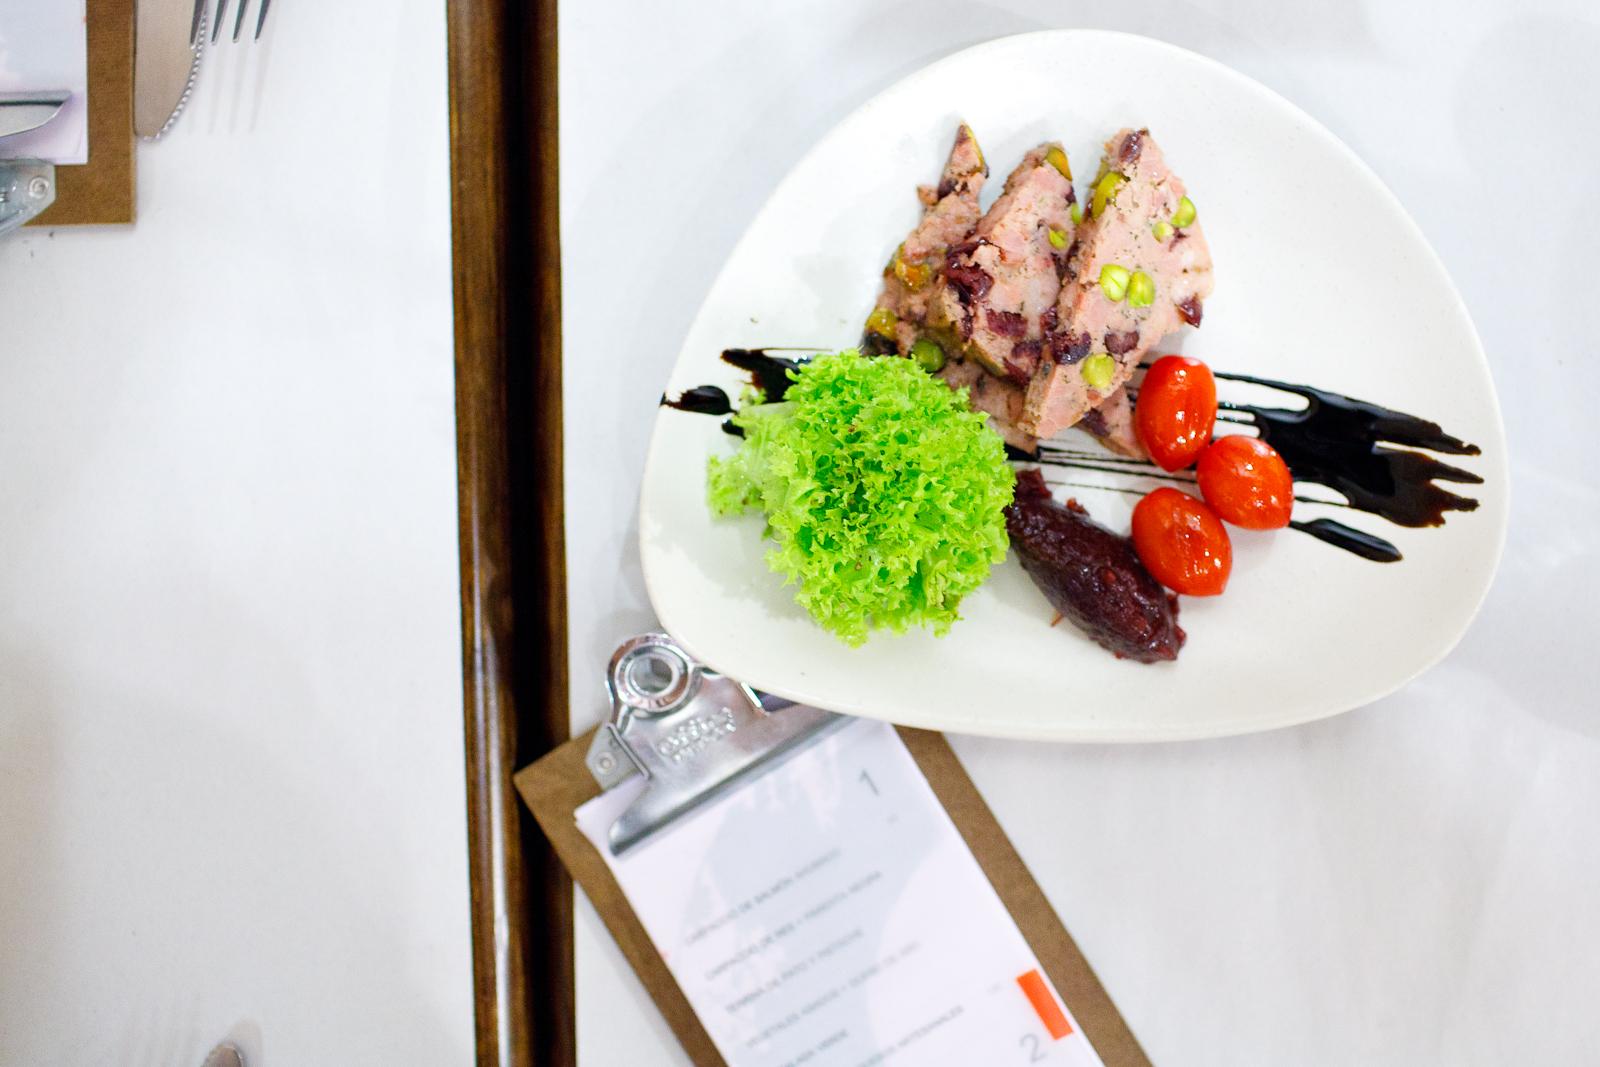 Terrina de pato y pistachio (Duck terrine with pistachio) ($65 MXP)